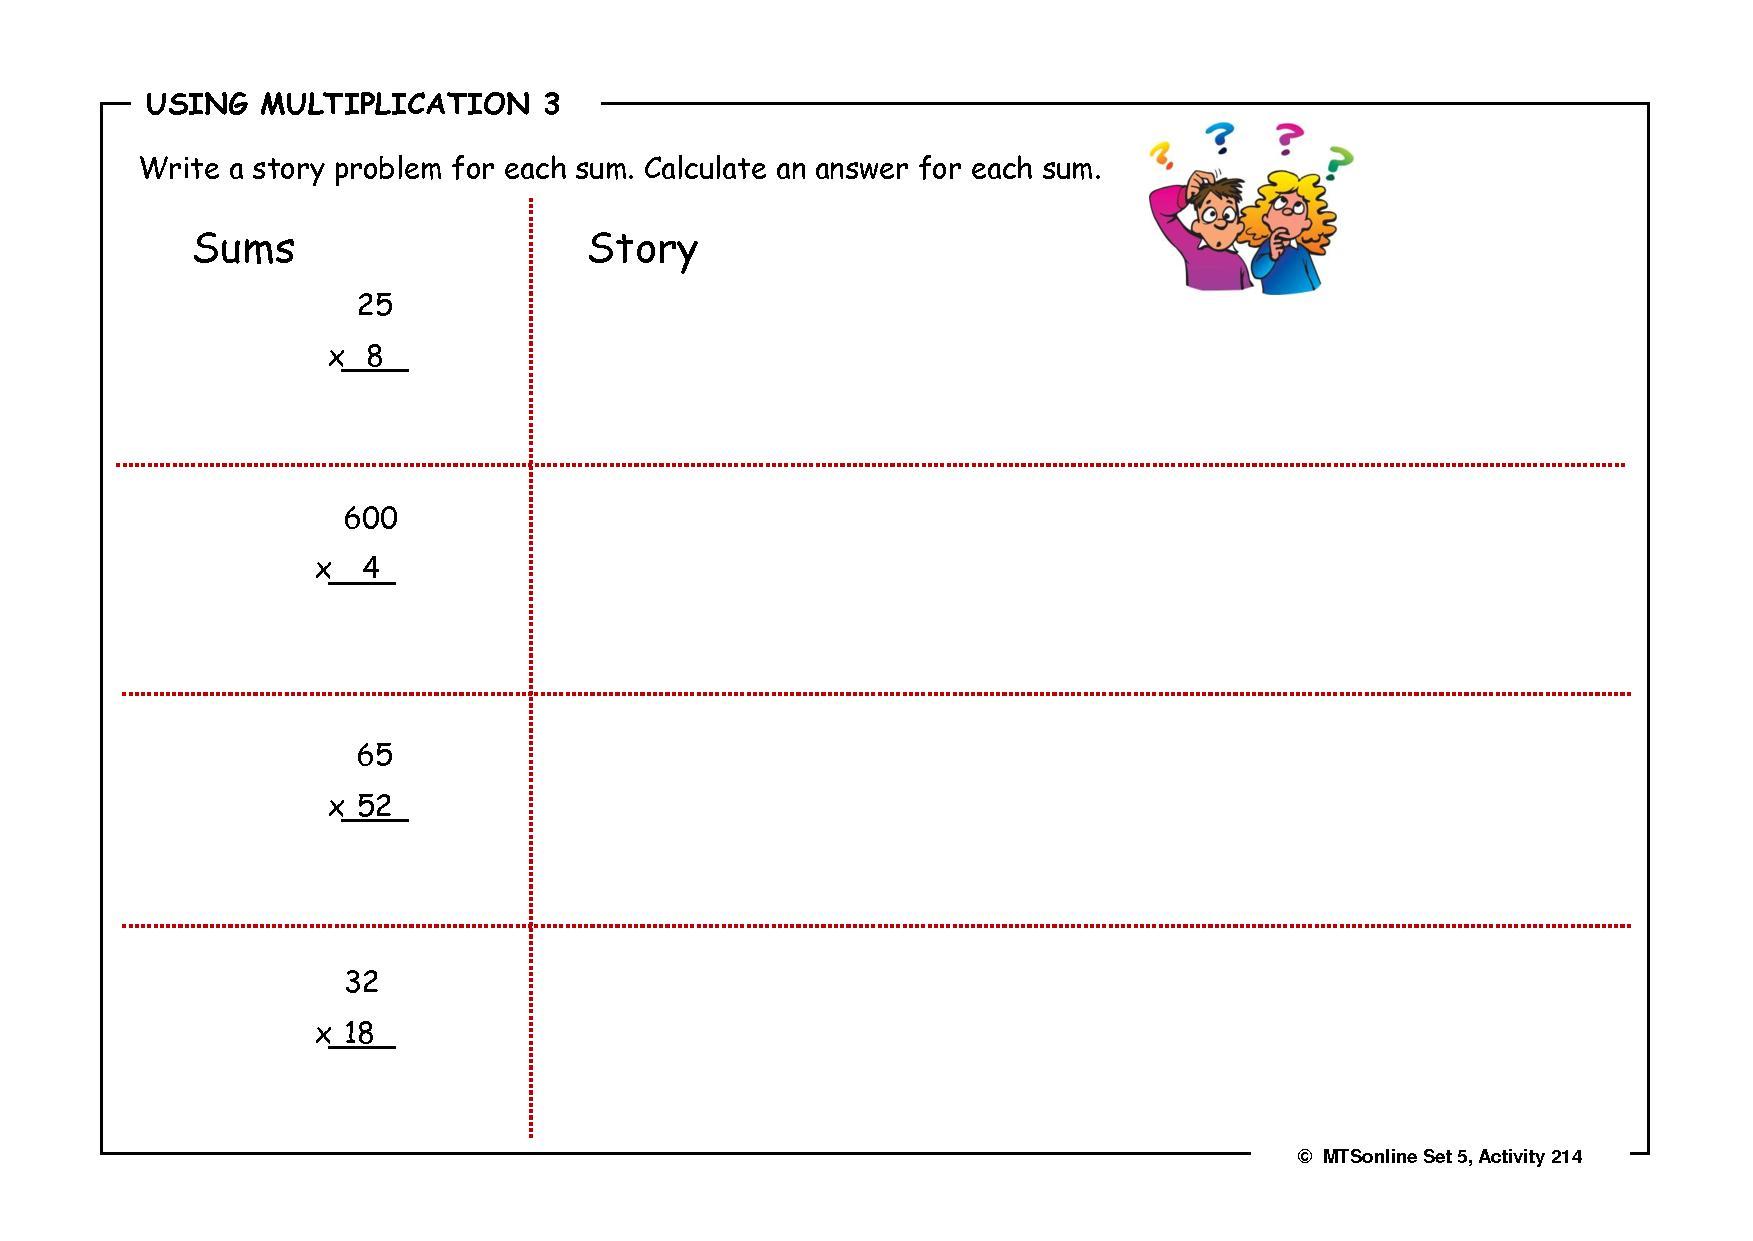 214using_multiplication_30001